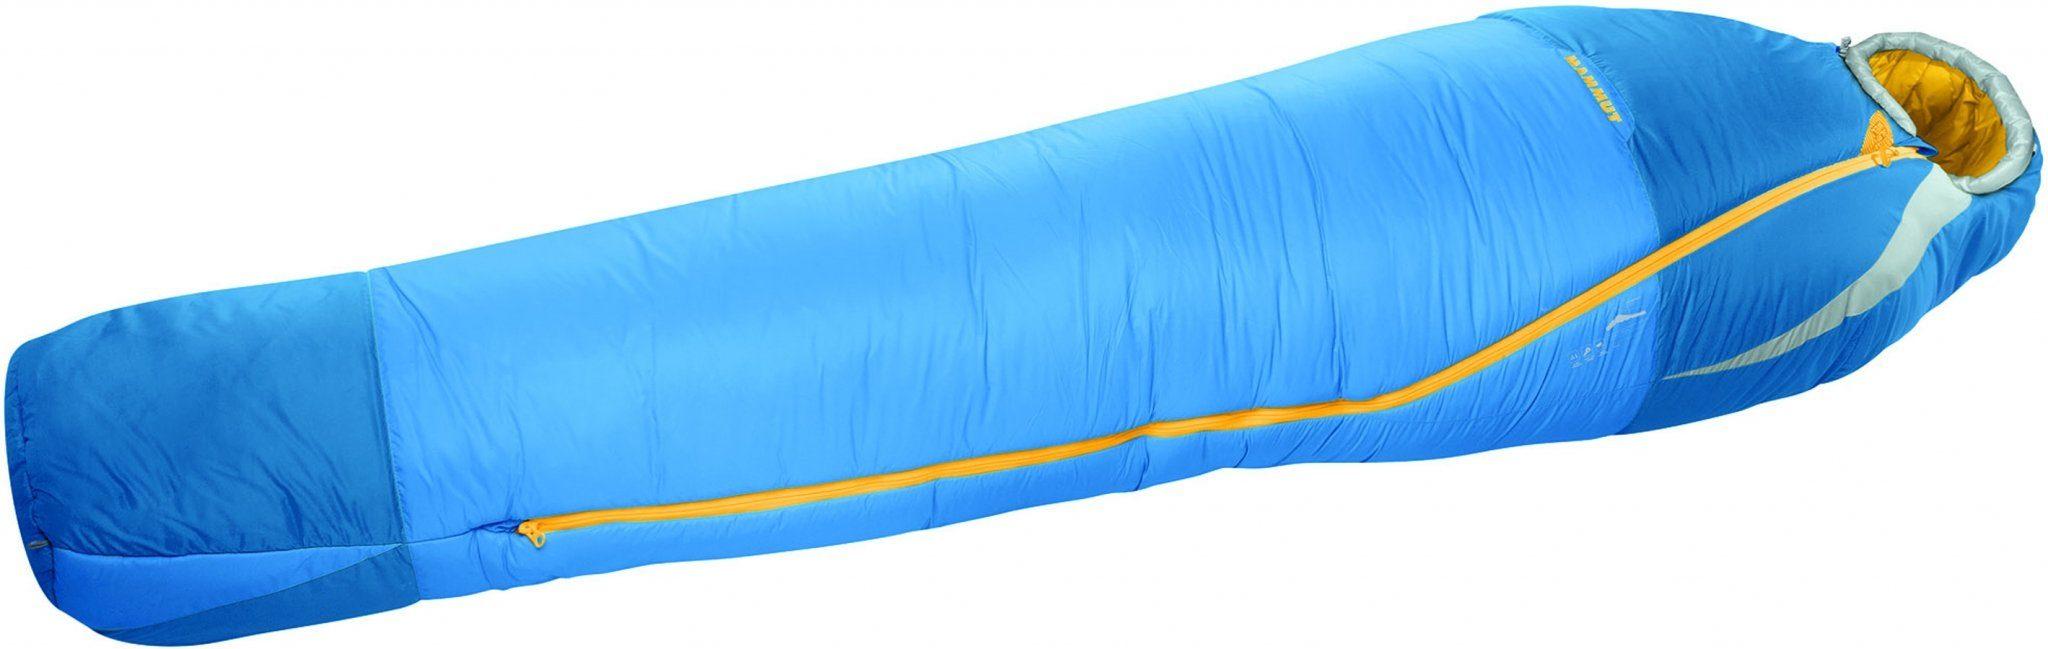 Mammut Schlafsack »Kompakt MTI Spring 180 Sleeping Bag«